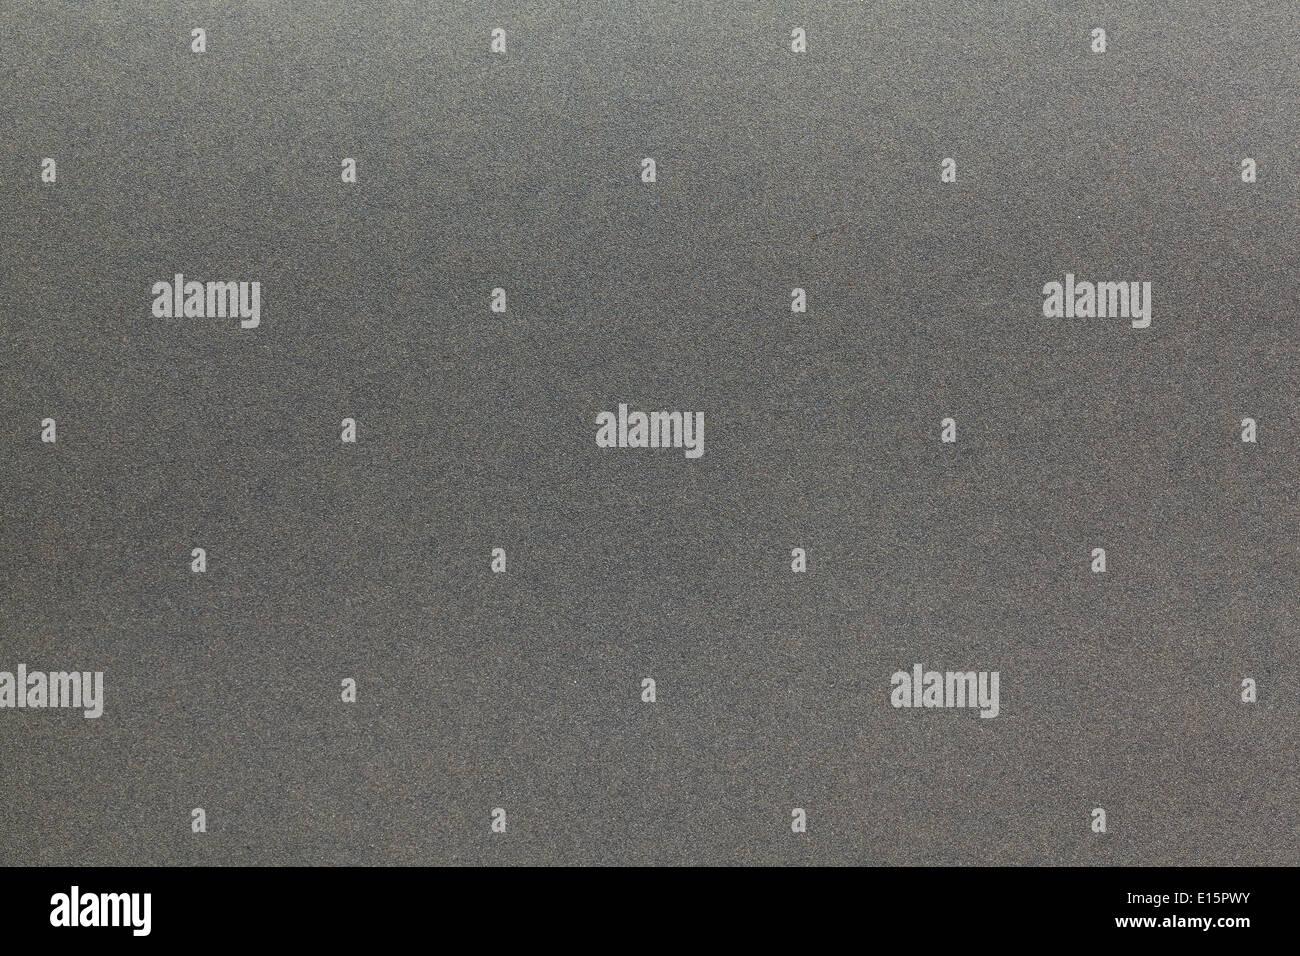 sheet of black sandpaper for background - Stock Image